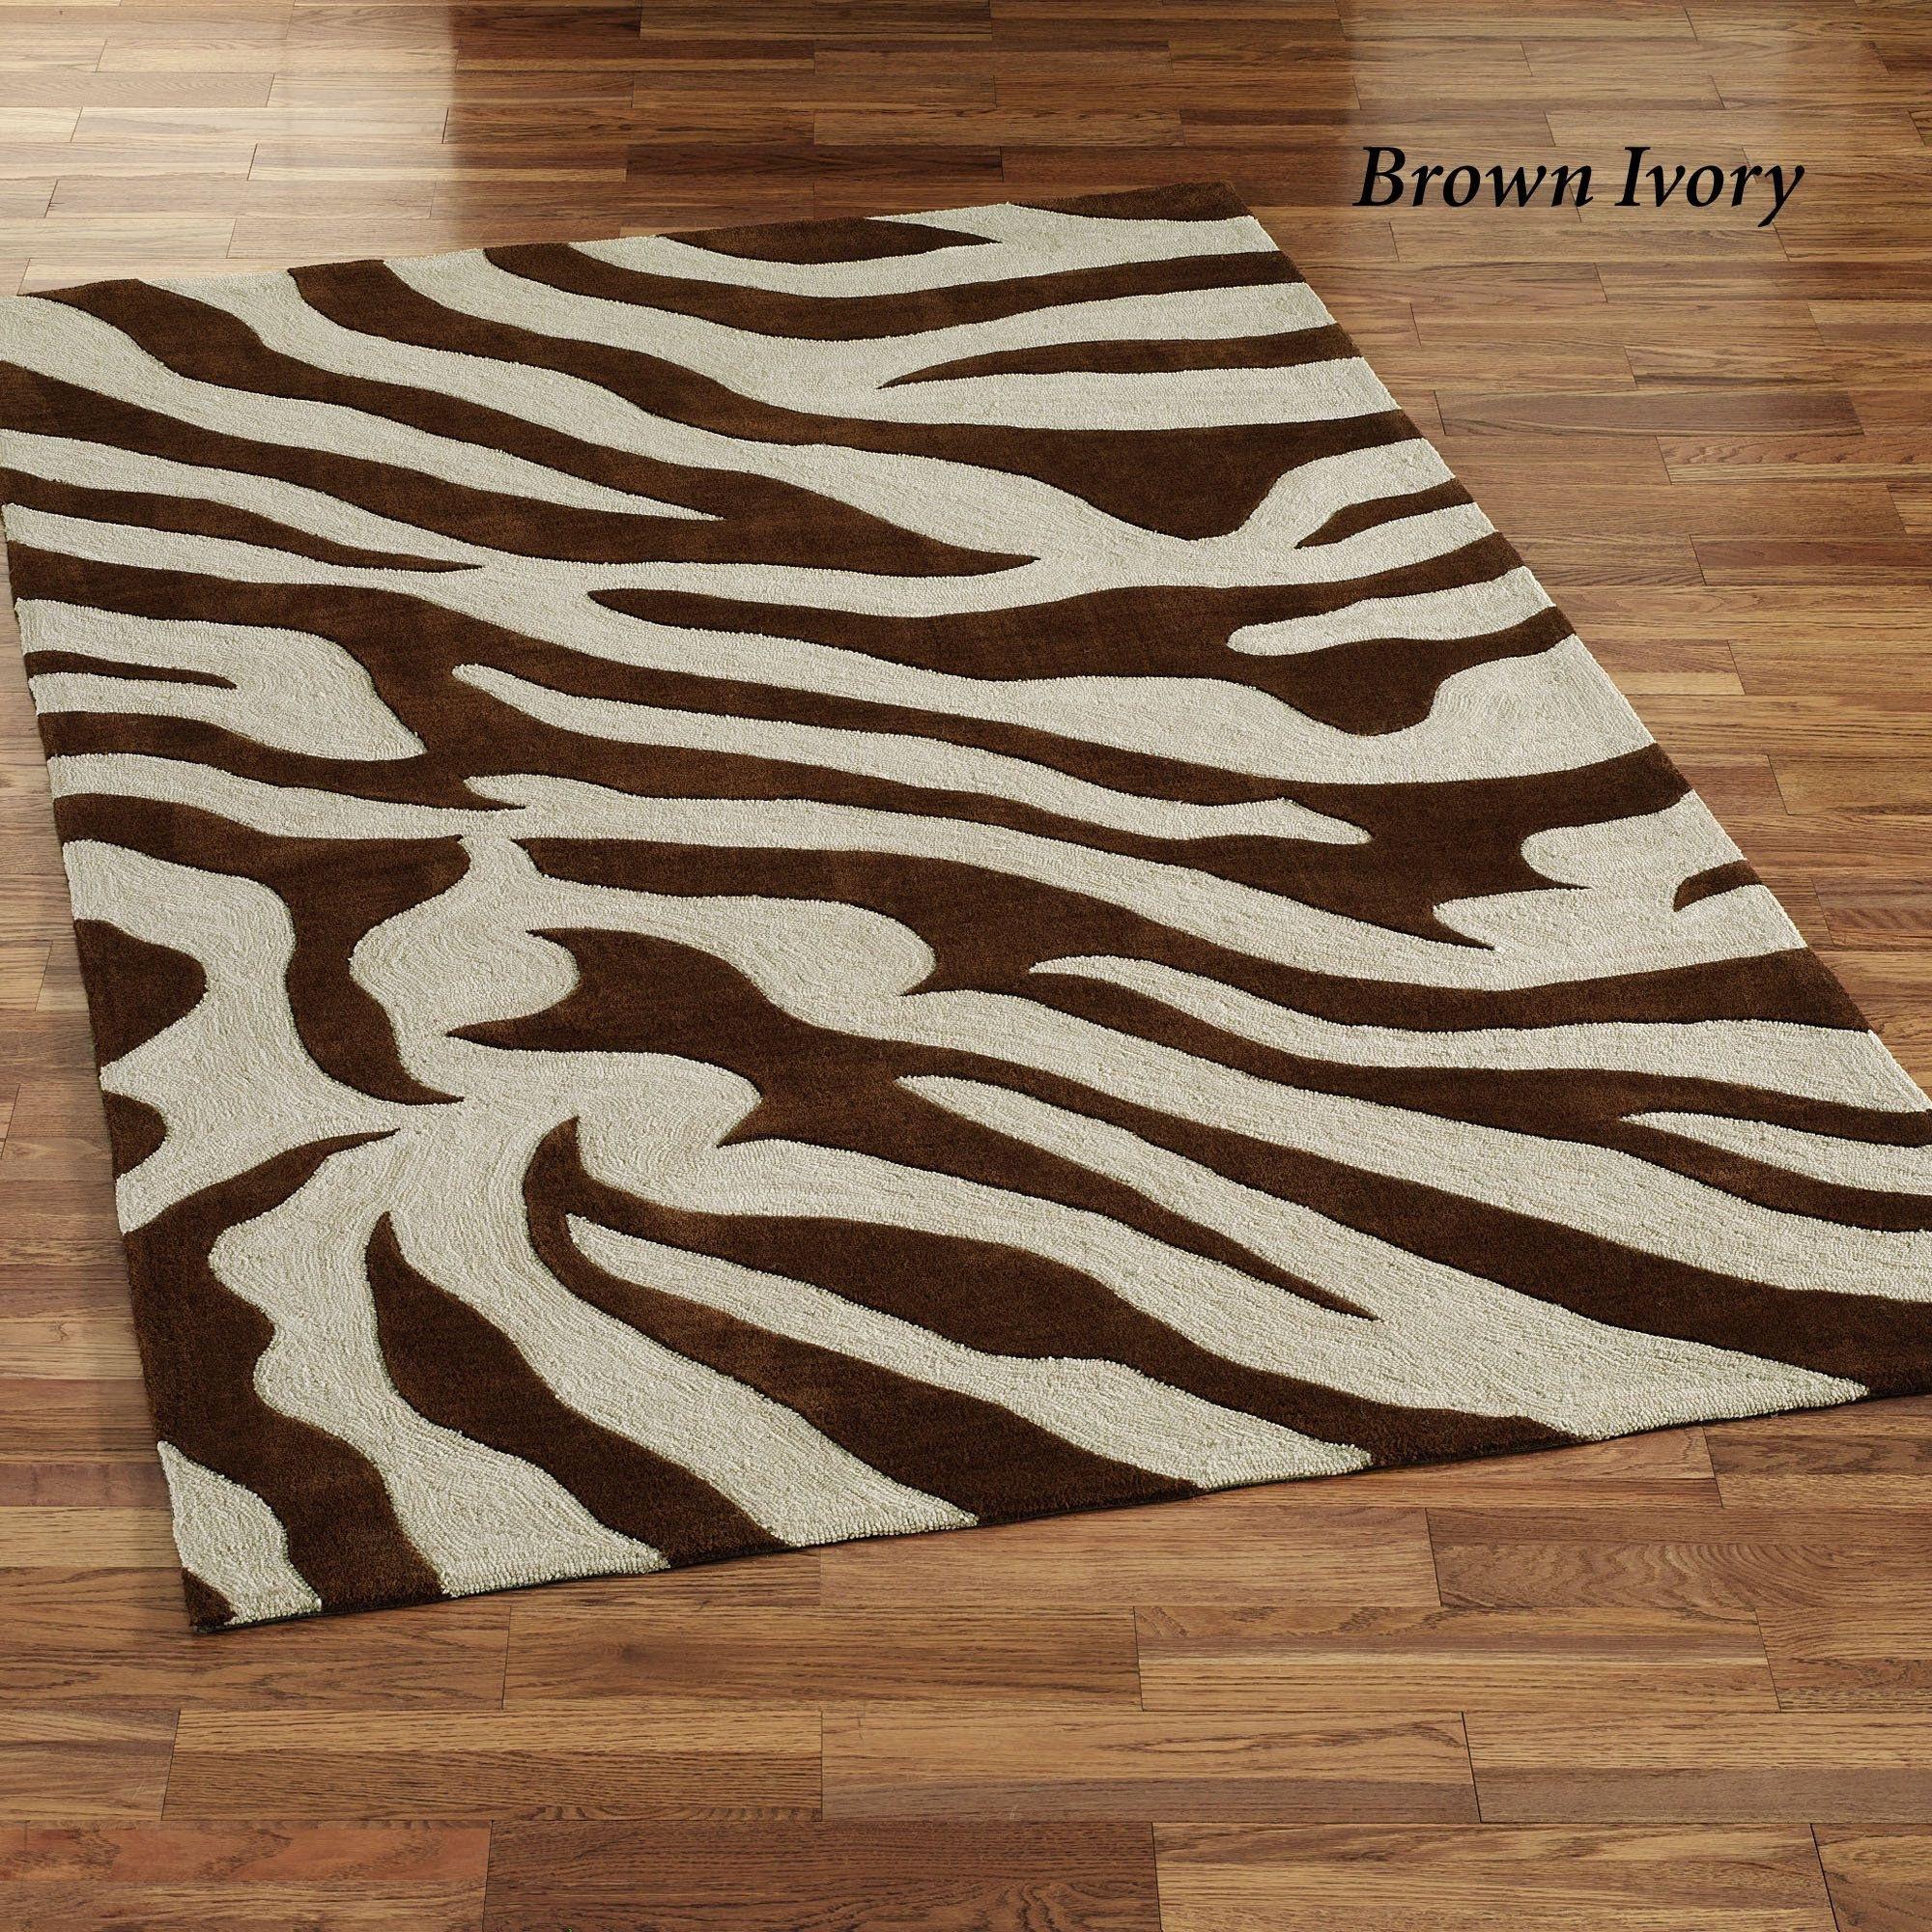 lowes 3 4 hardwood flooring of lowes rugs runner luxury most popular area rugs lowes cool rugs with lowes rugs runner luxury most popular area rugs lowes cool rugs lowes design ideas with collection